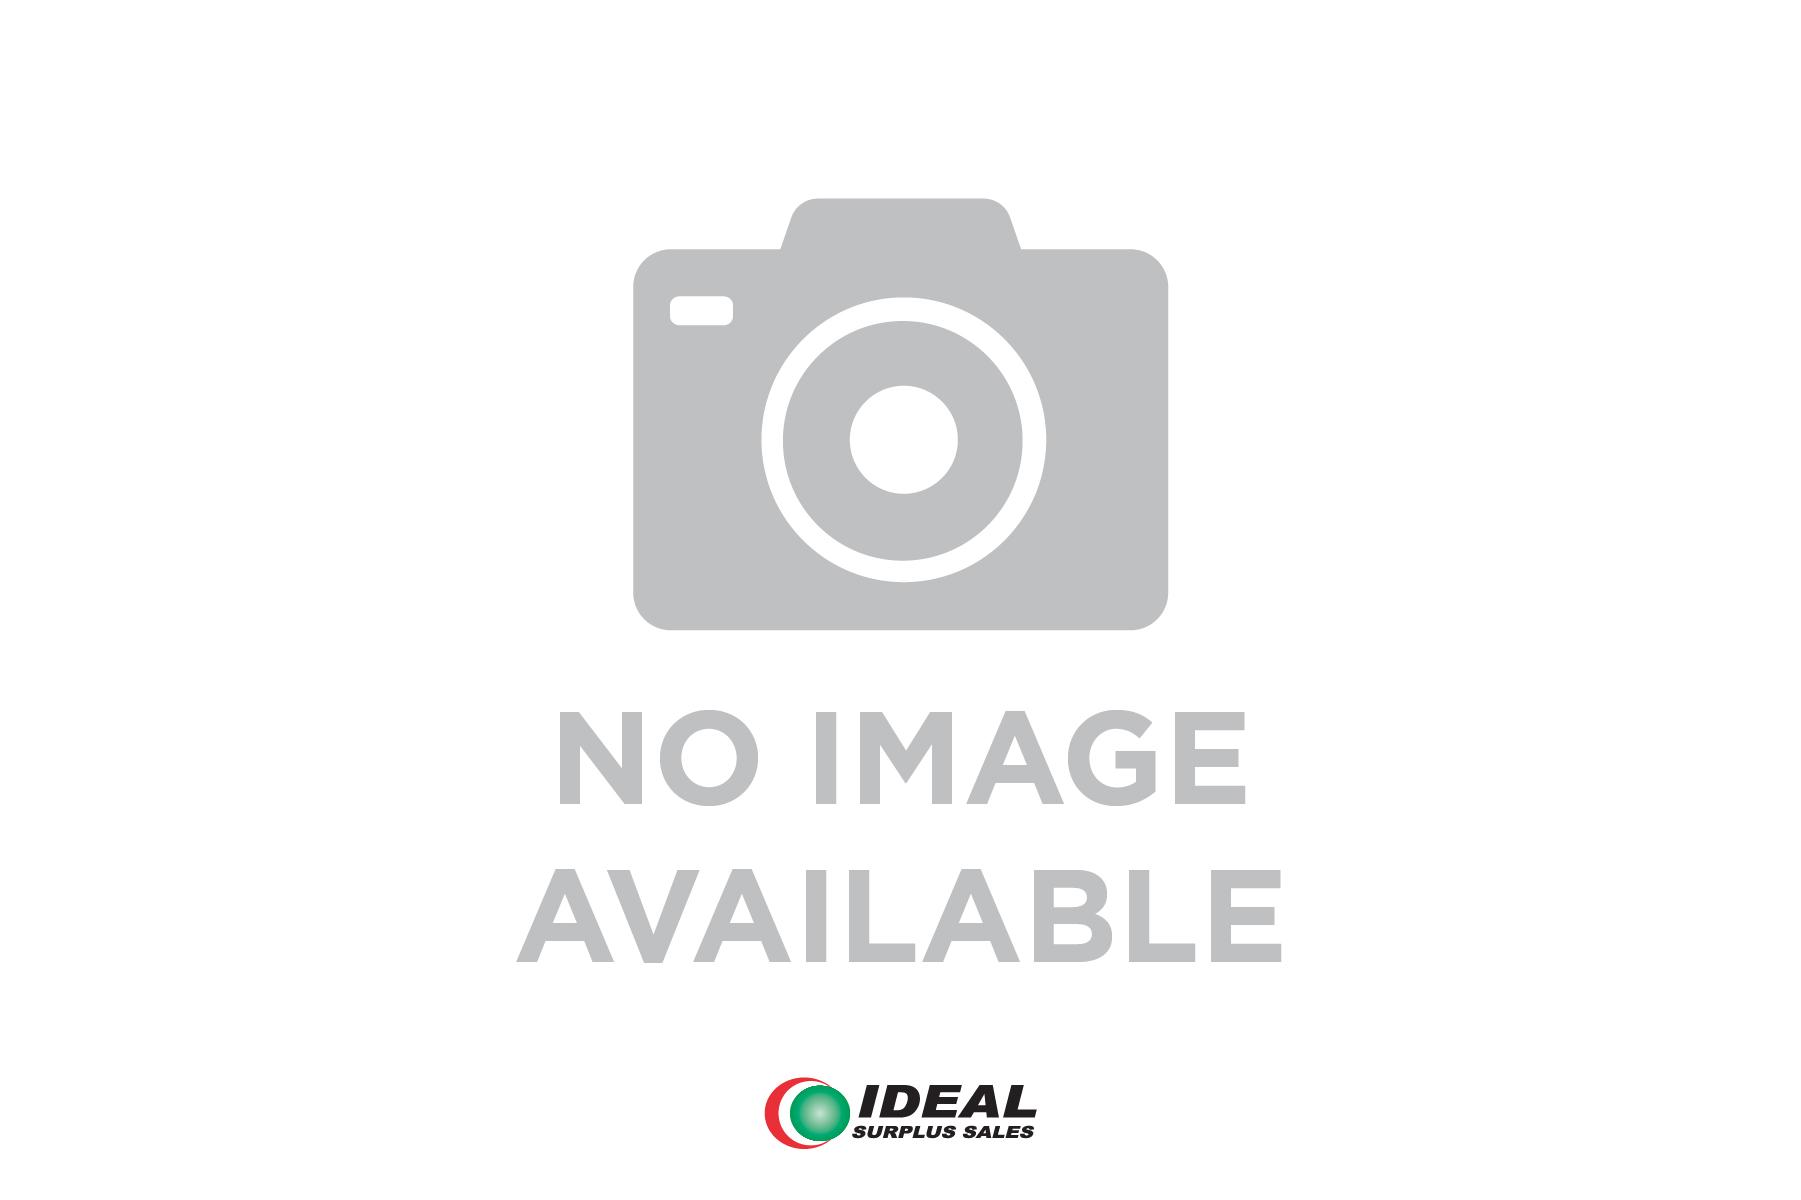 MODICON 140-ESI-062-10 MODULE